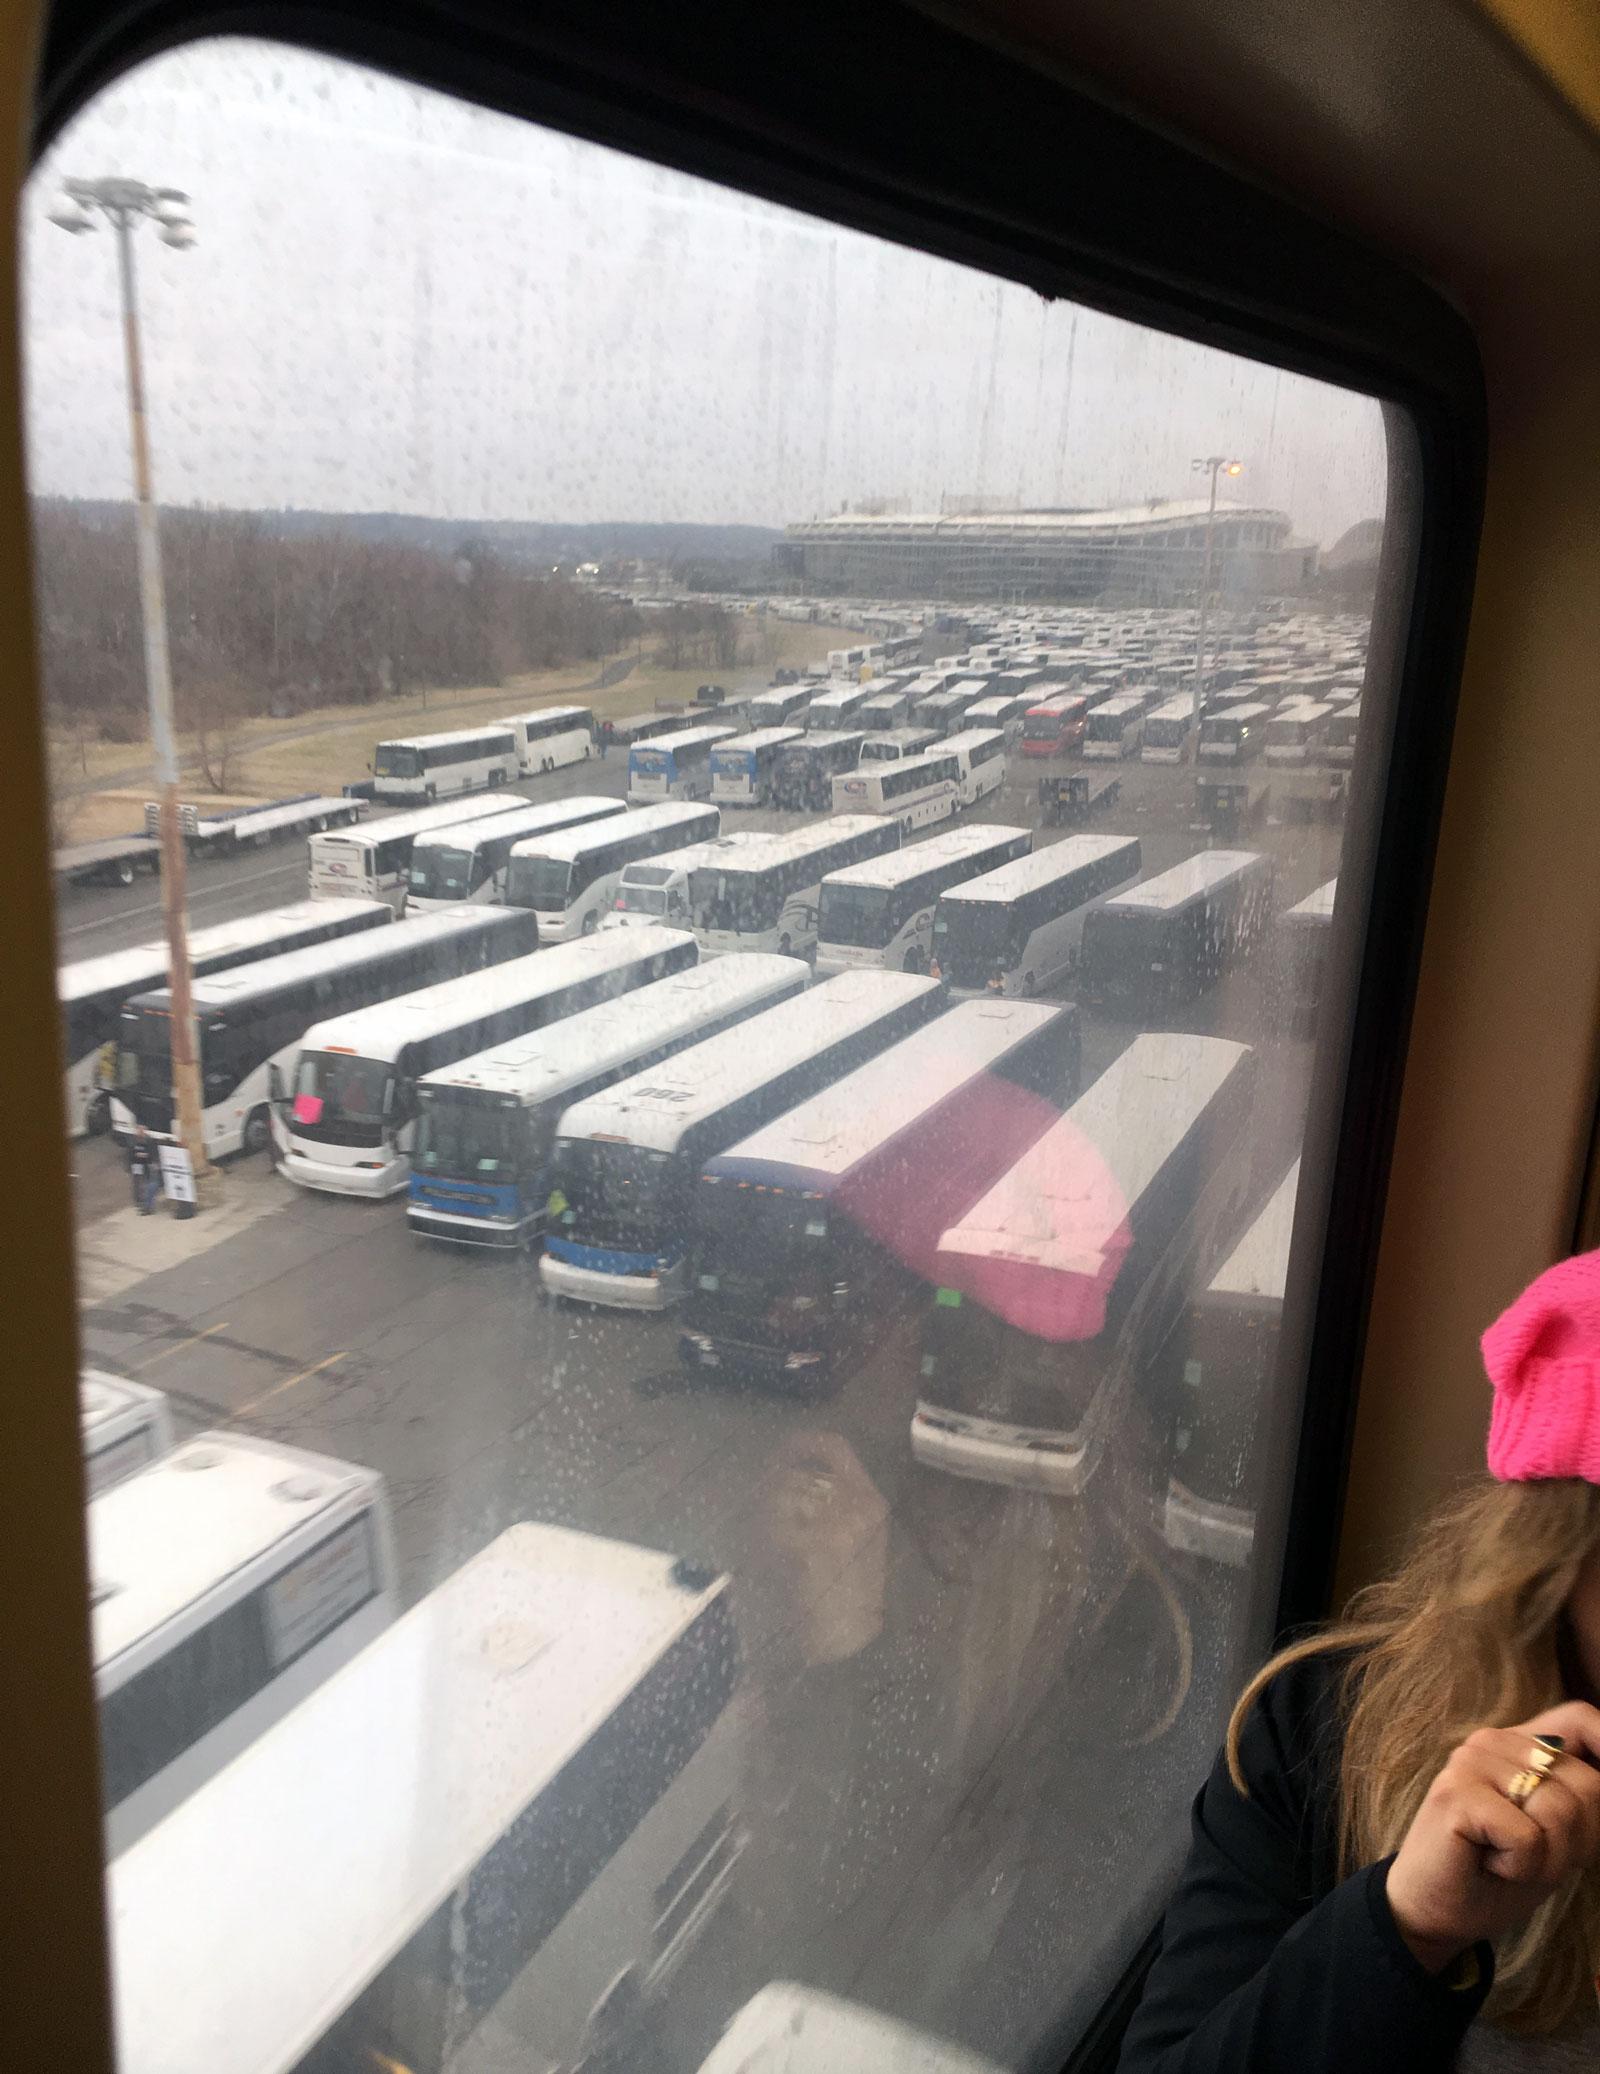 Buses at RFK Stadium, Washington, D.C, Saturday, January 21